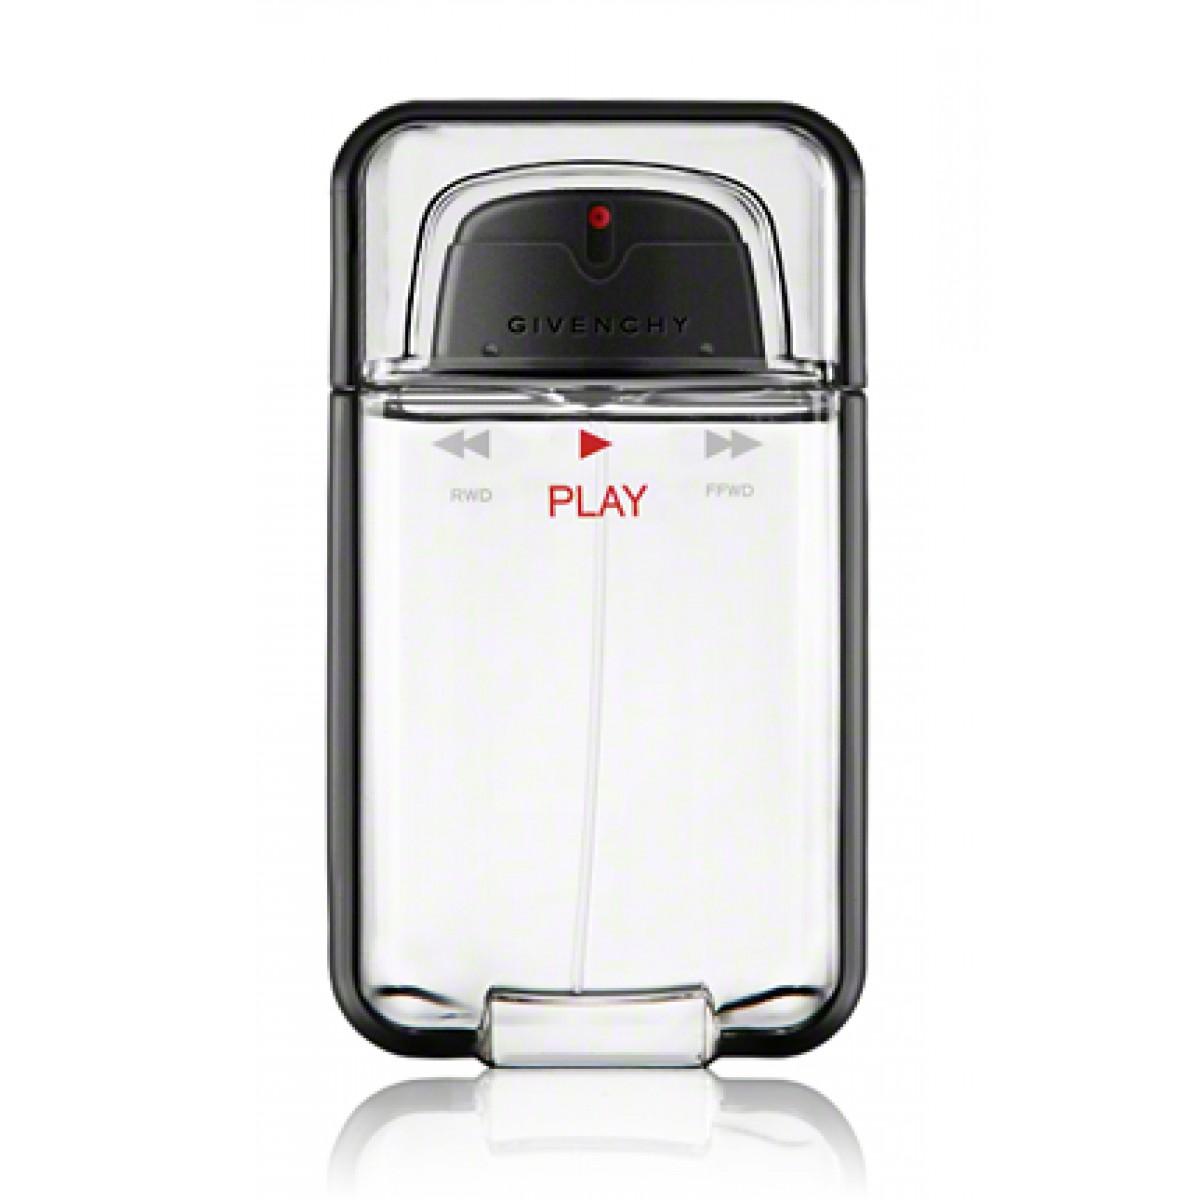 Givenchy Play eau de toilette spray 50 ml